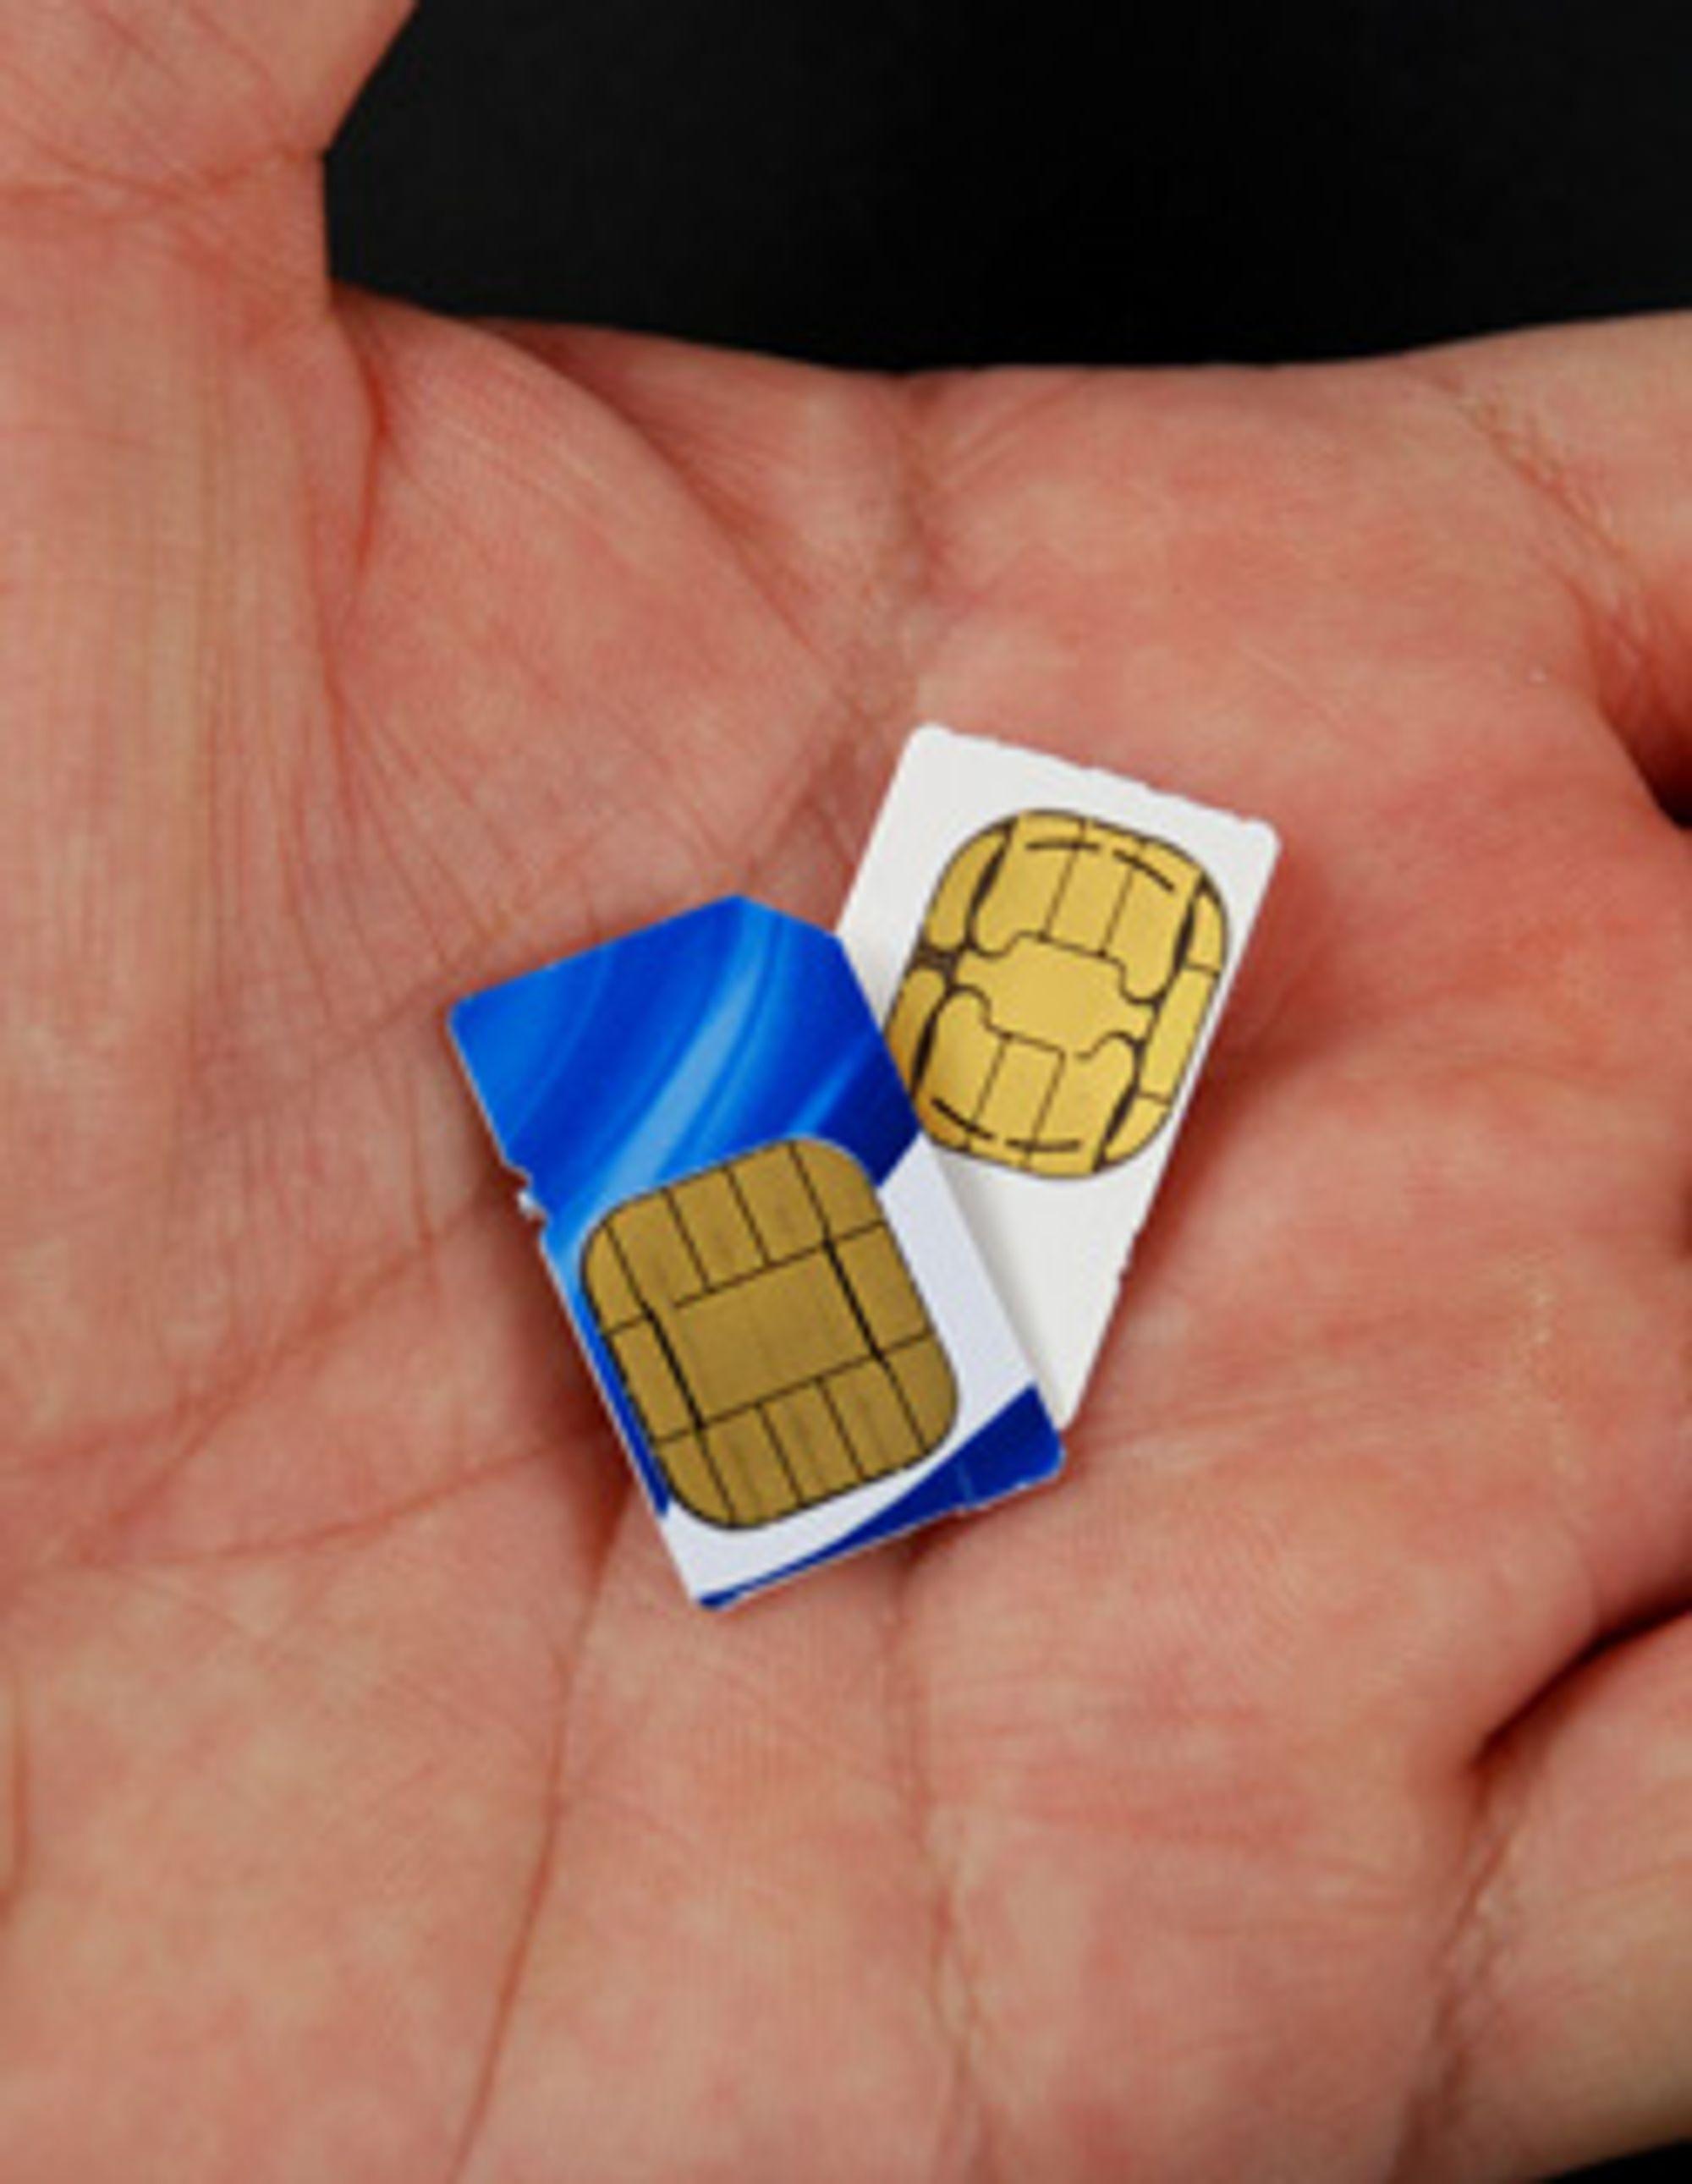 Geodesa lager SIM med plass til to numre. (Foto: Istockphoto)